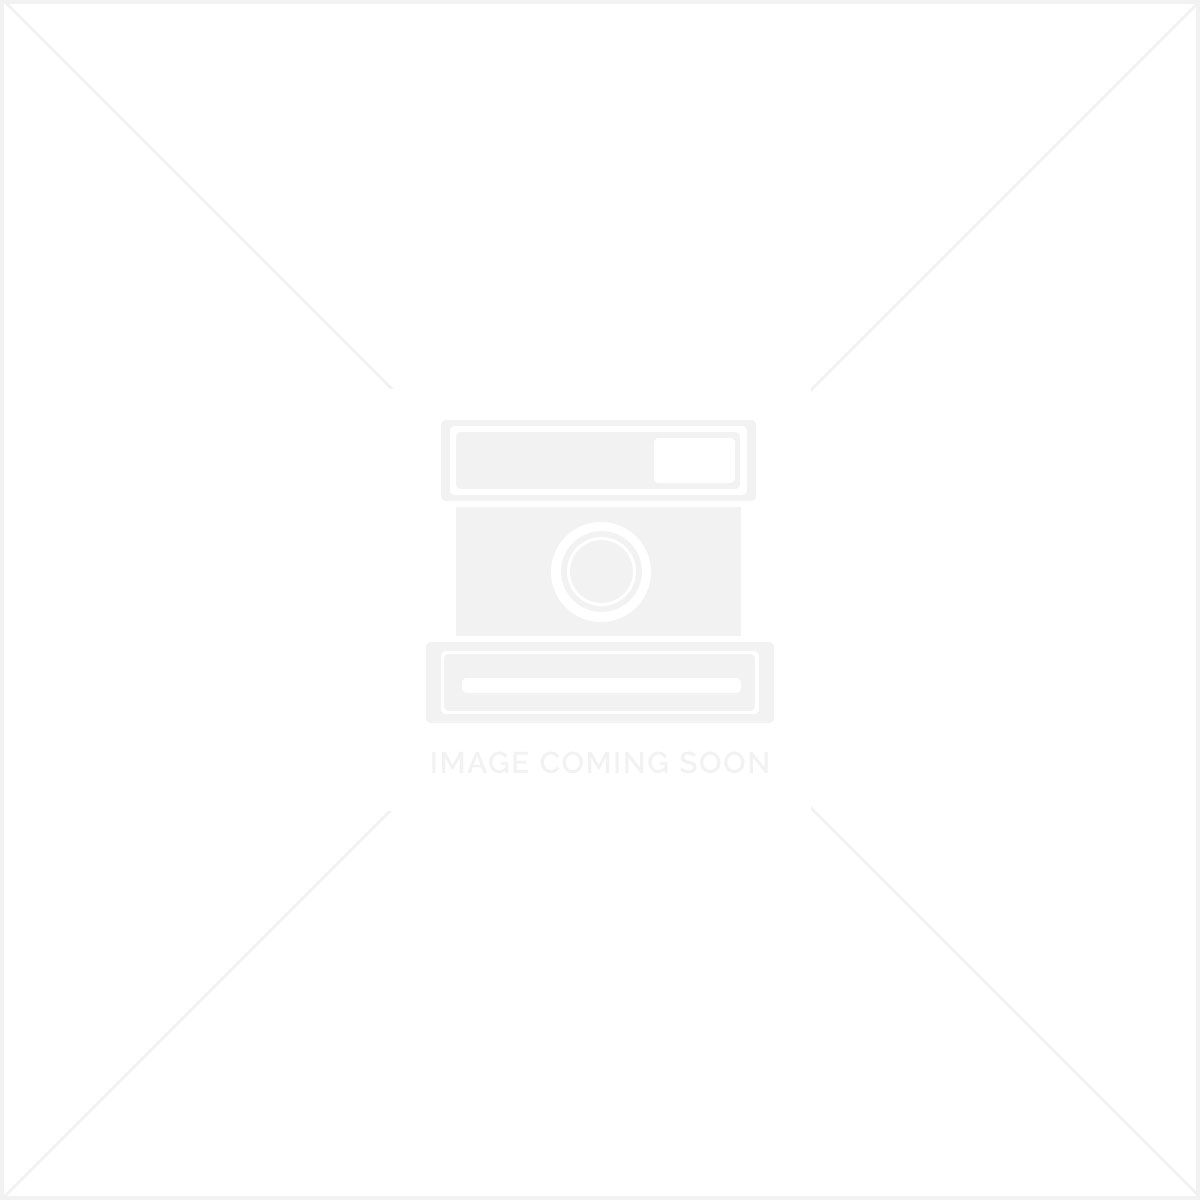 Strome Heavy weight Fabric 4 Fat Quarters Weathered Tartan - Craft Bundle